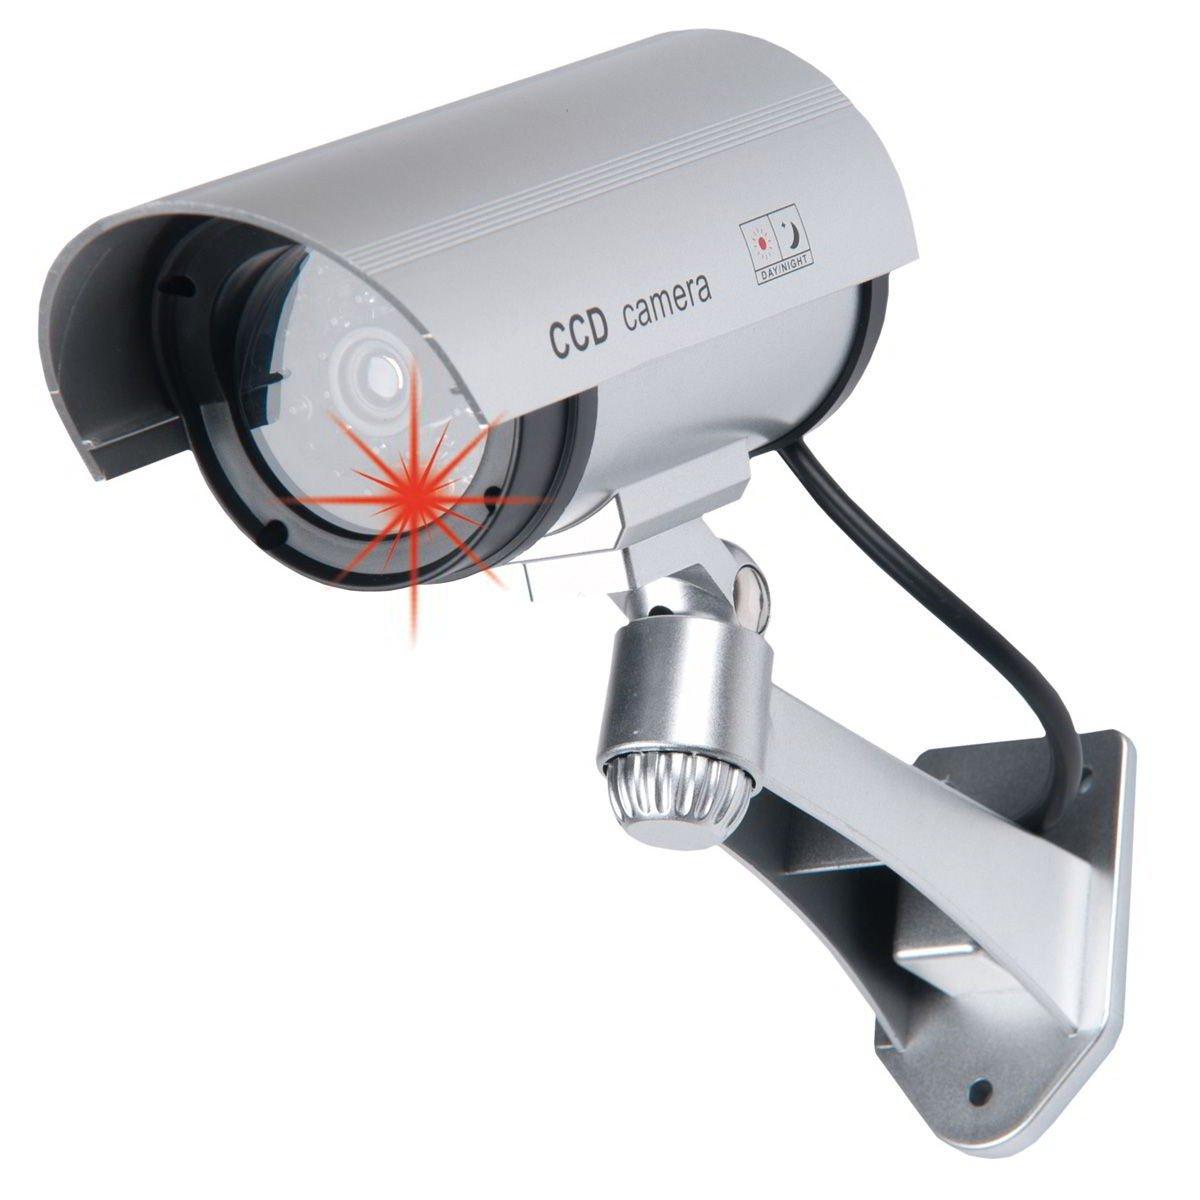 First Alarma Wireless Dummy Camera LED Webcam: Amazon.es ...